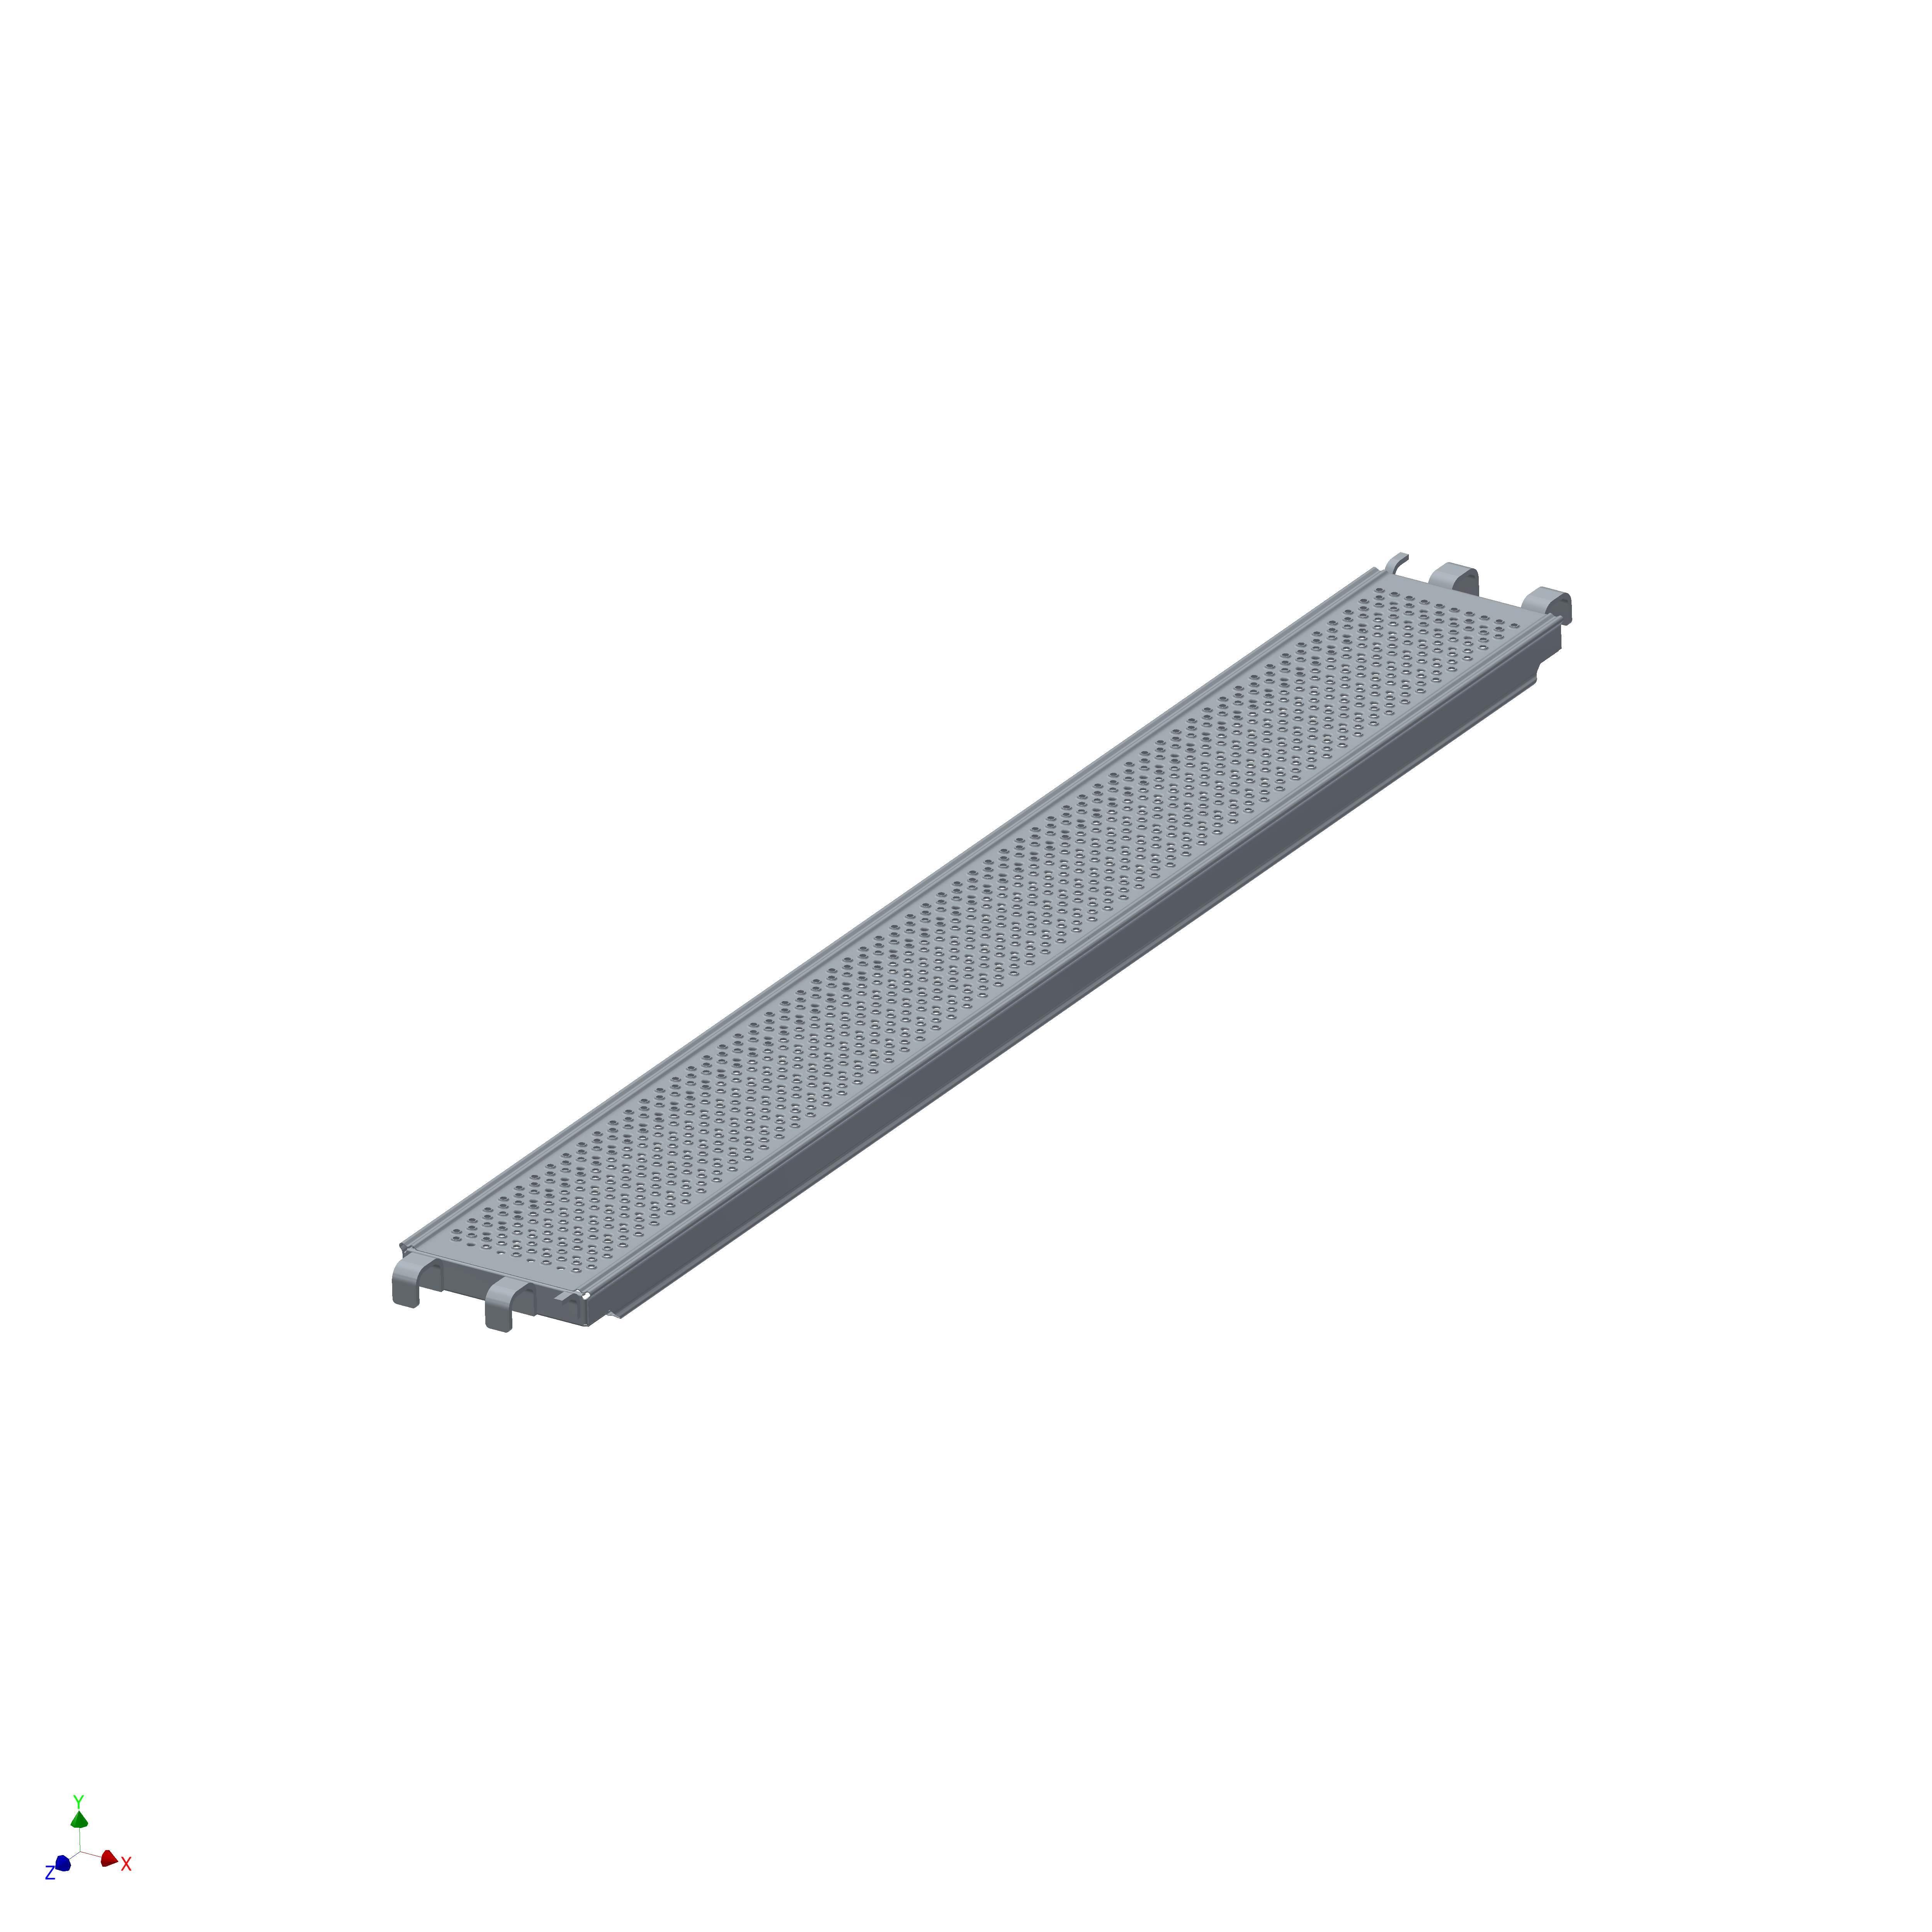 [Other] U pomost ,u type steel plank rusztowanie Baumann